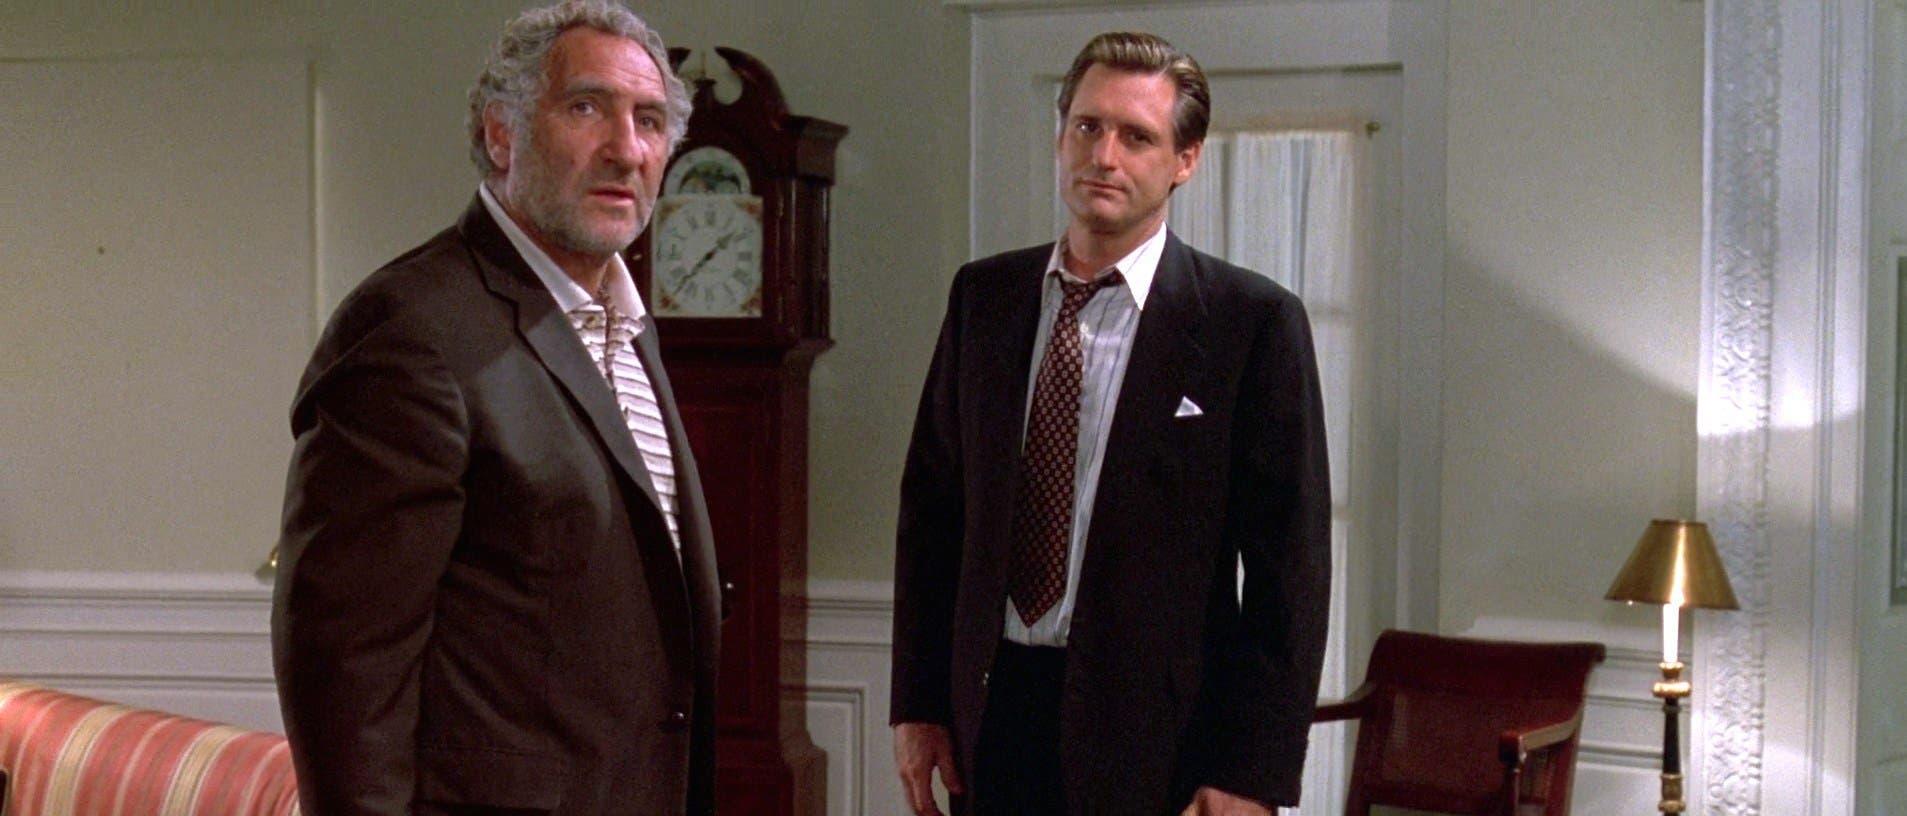 Independence-Day-Bill-Pullman-and-Judd-Hirsch